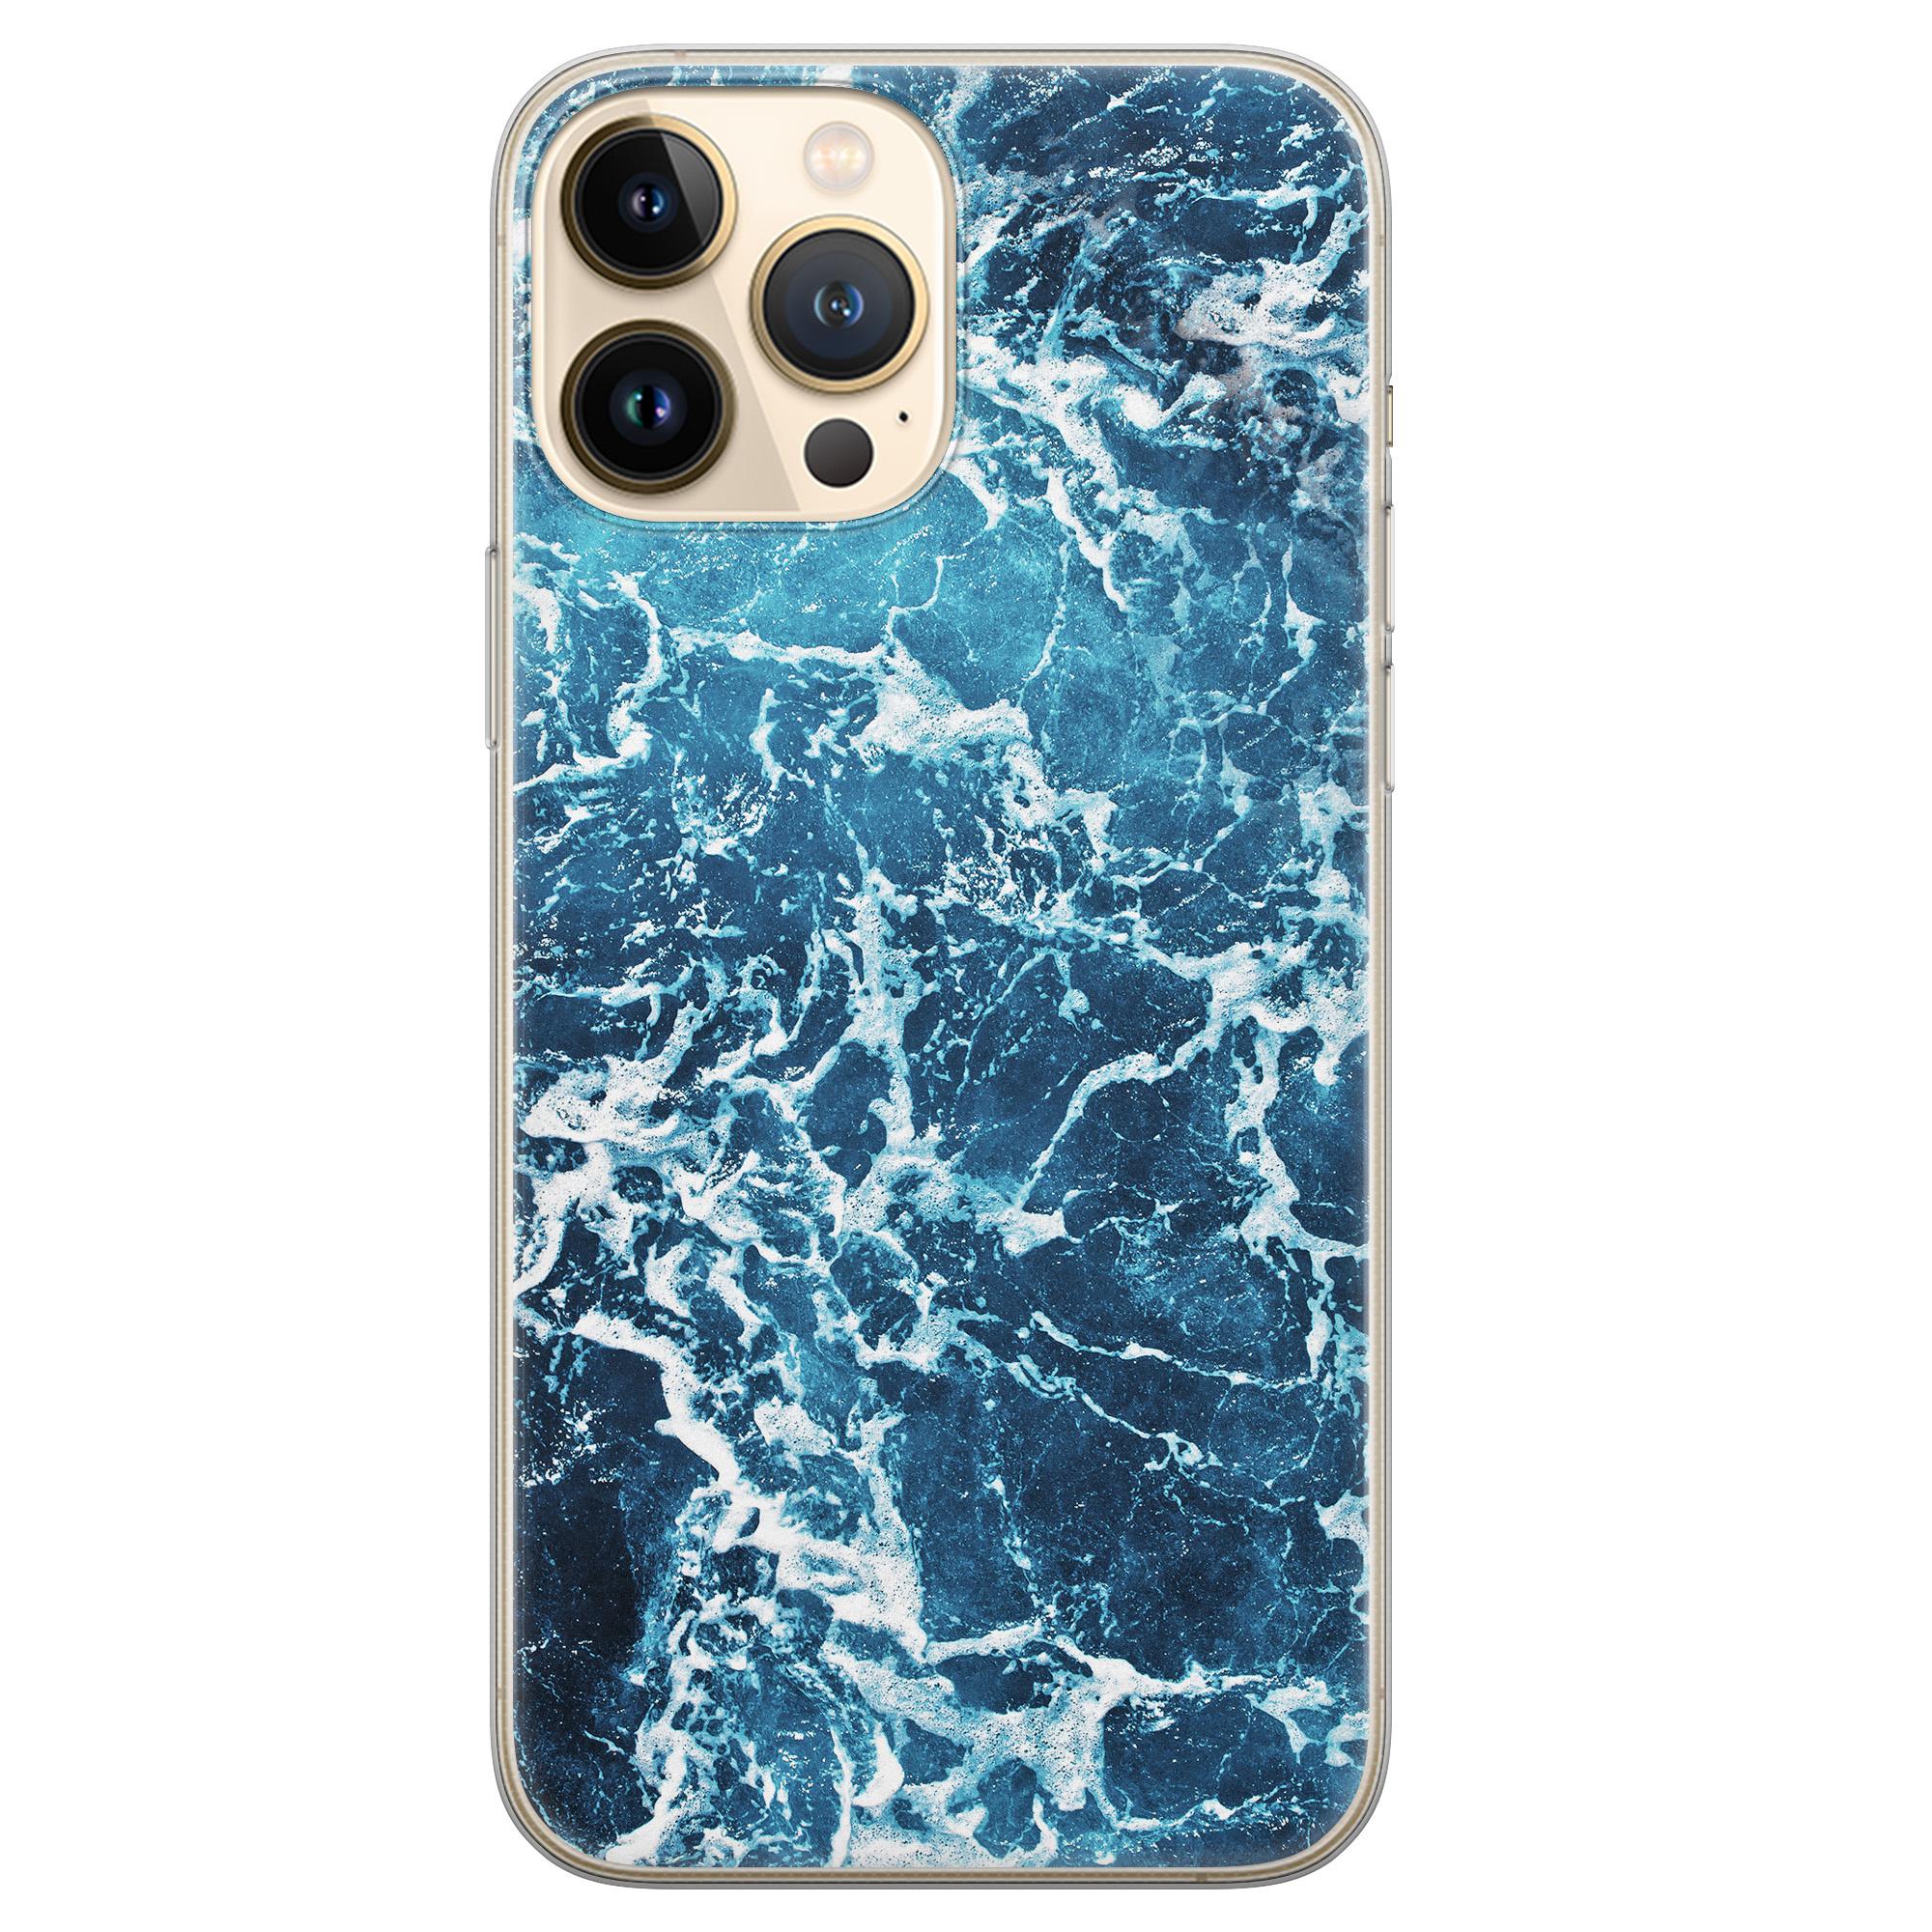 Leuke Telefoonhoesjes iPhone 13 Pro Max siliconen hoesje - Ocean blue